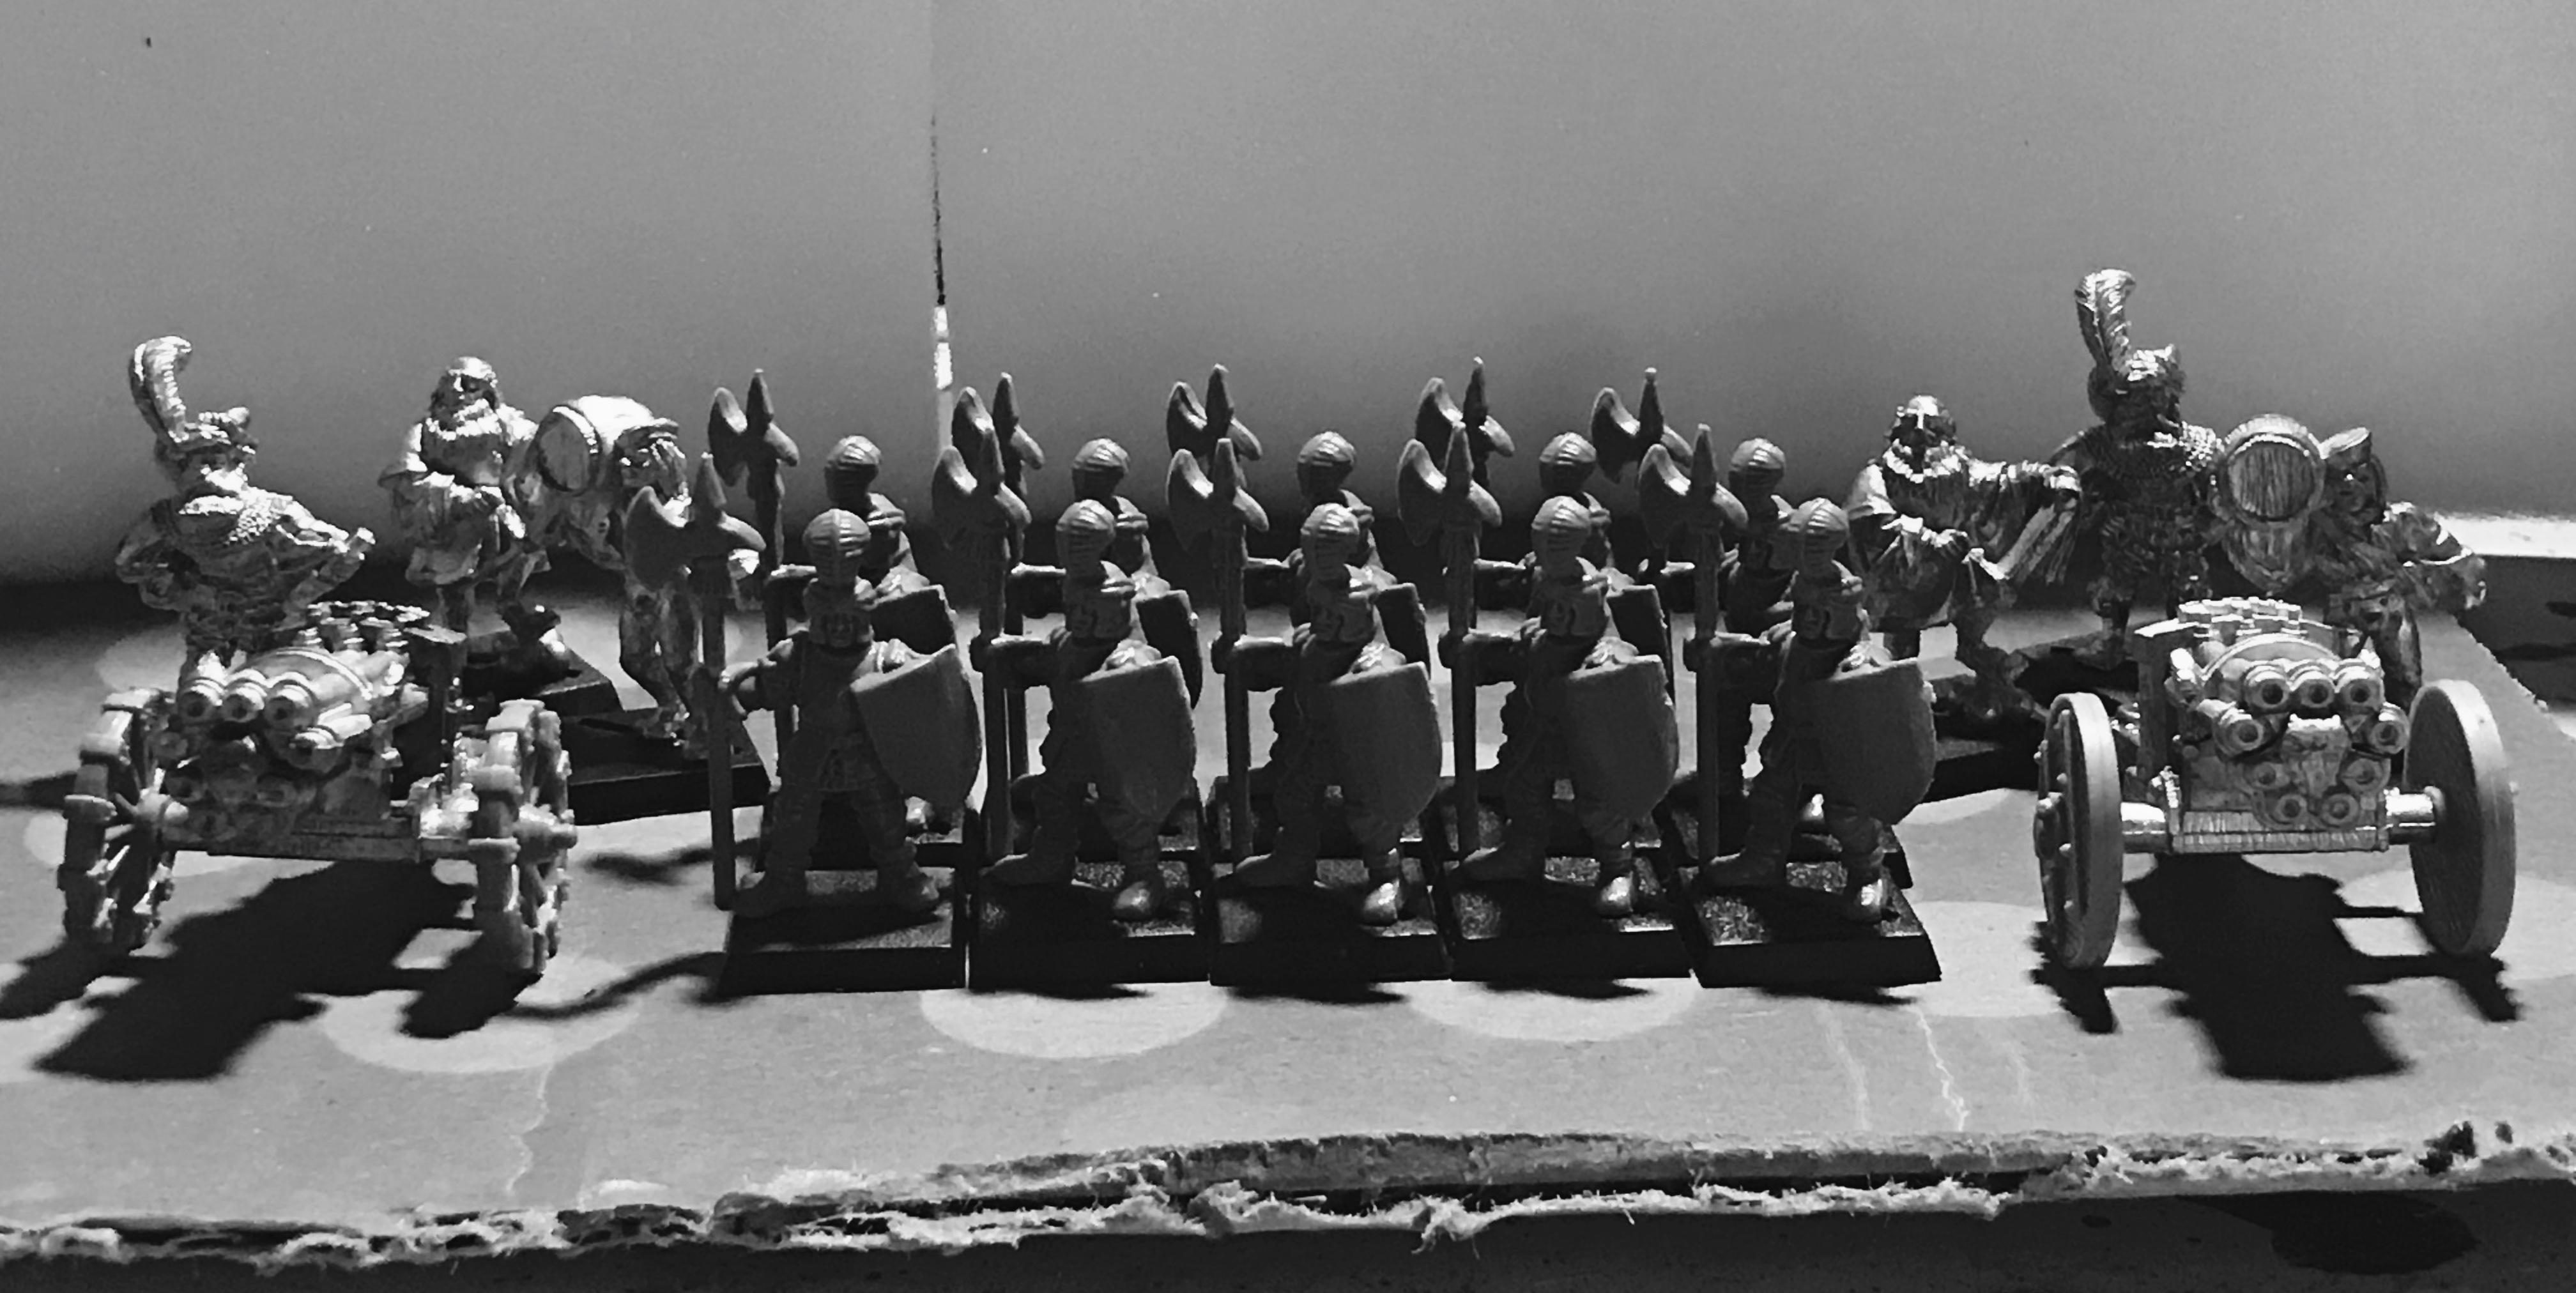 Artillery, Averland, Battle, Battles, Black, Blazing, Cavalry, Circle, County, Empire, Game, Grand, Gun, Halbardiers, Helblaster, Infantry, Inner, Knights, Middlehammer, Of, Oldhammer, Powder, State, Sun, Troops, Volley, Warhammer Fantasy, Weapon, Work In Progress